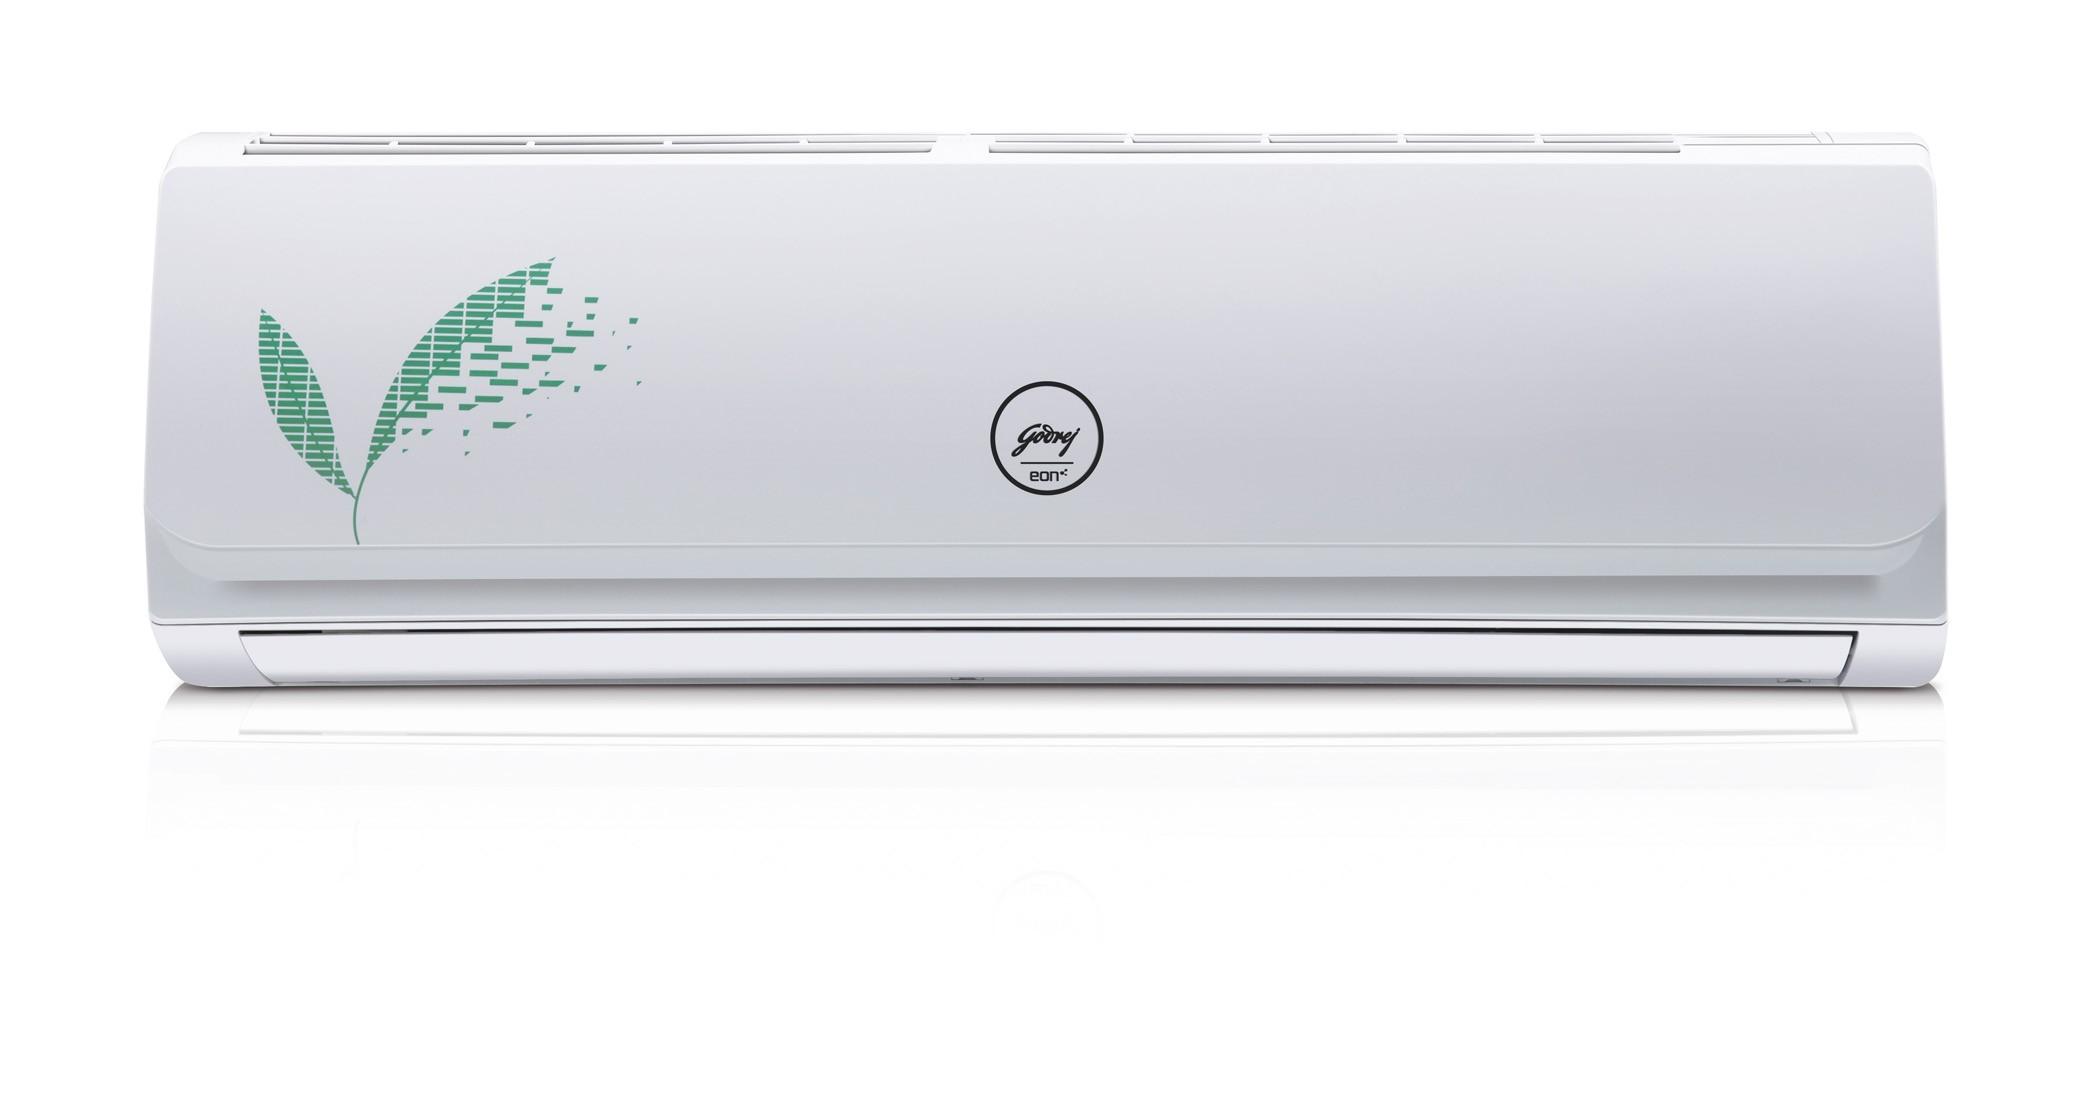 ... concare godrej appliances service center in perungudi, concare godrej  appliances service center in poonamallee,